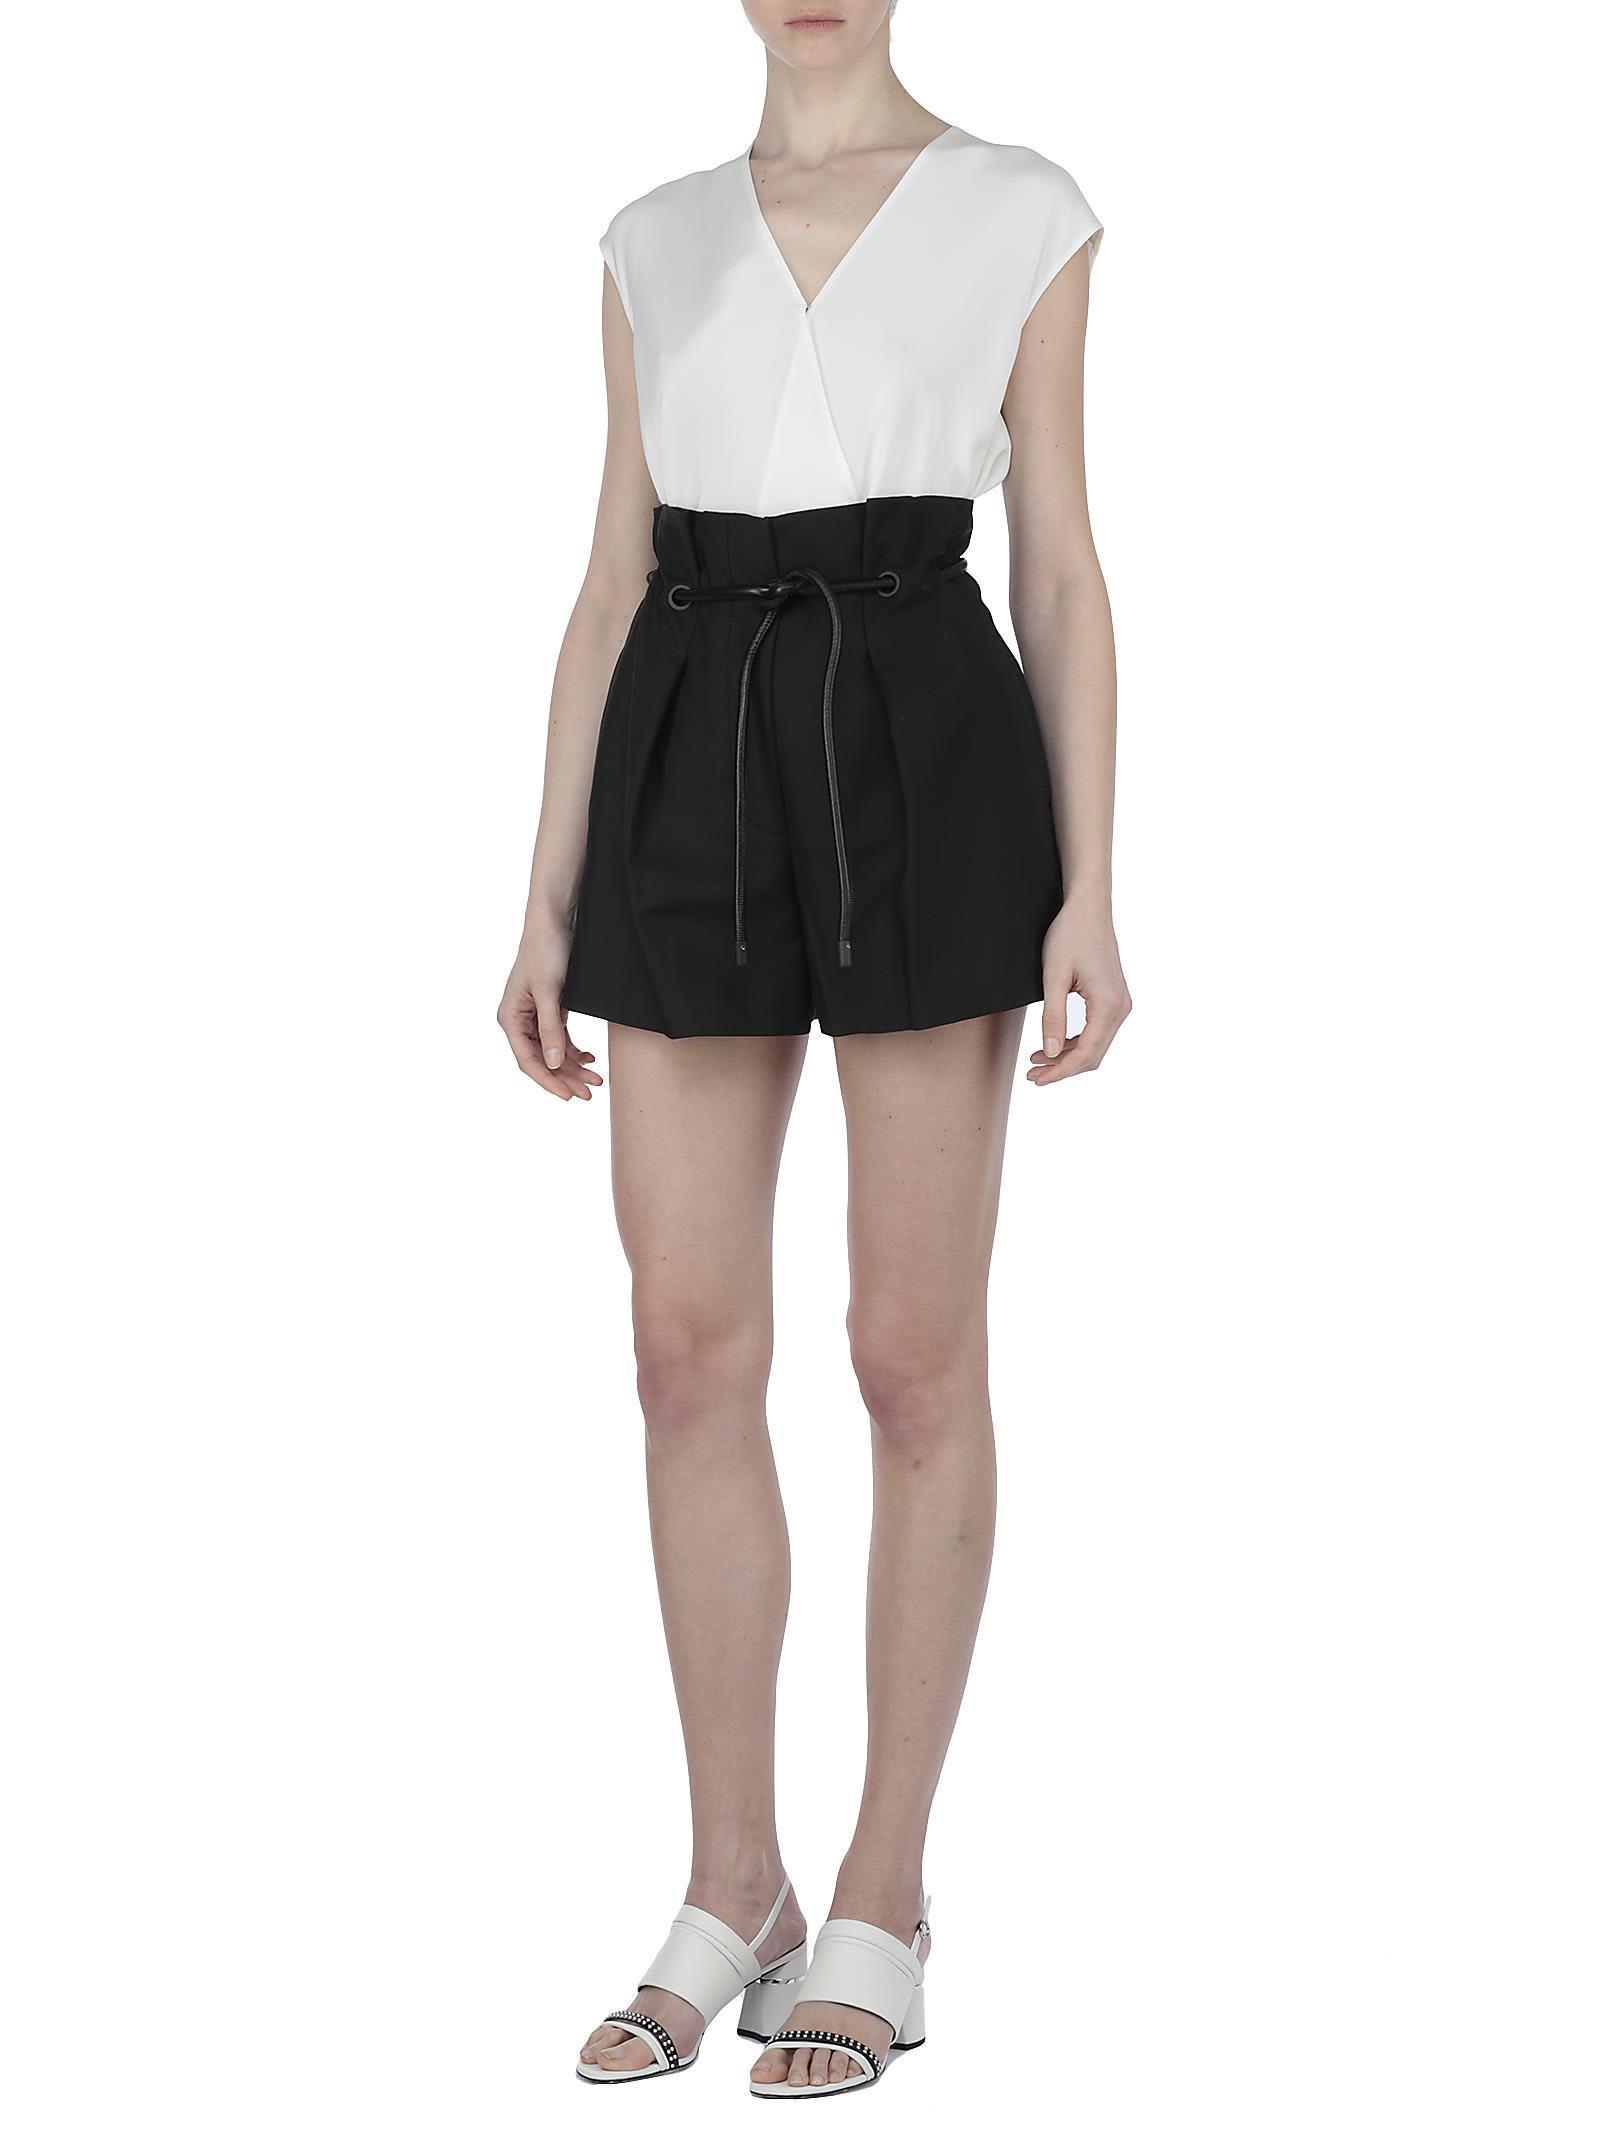 3.1 Phillip Lim Cotton Blend Shorts In Black